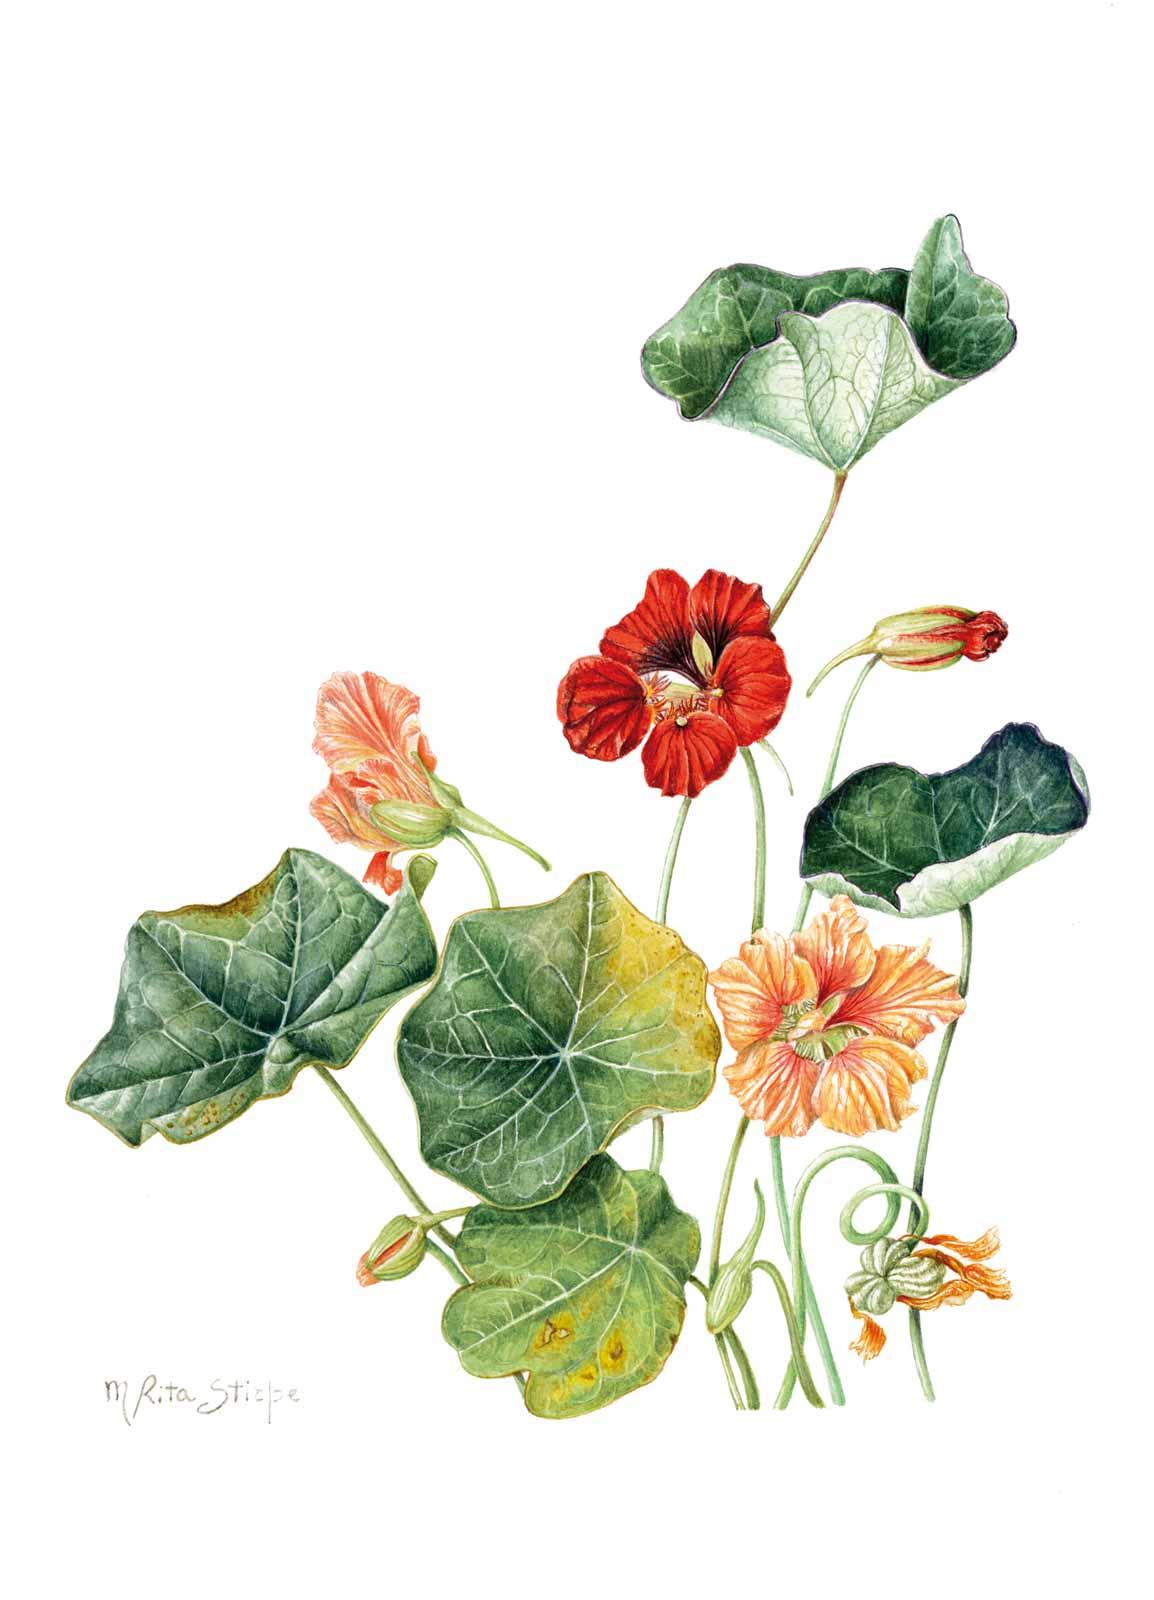 Catalogo - Ars Botanica - Stampa 11